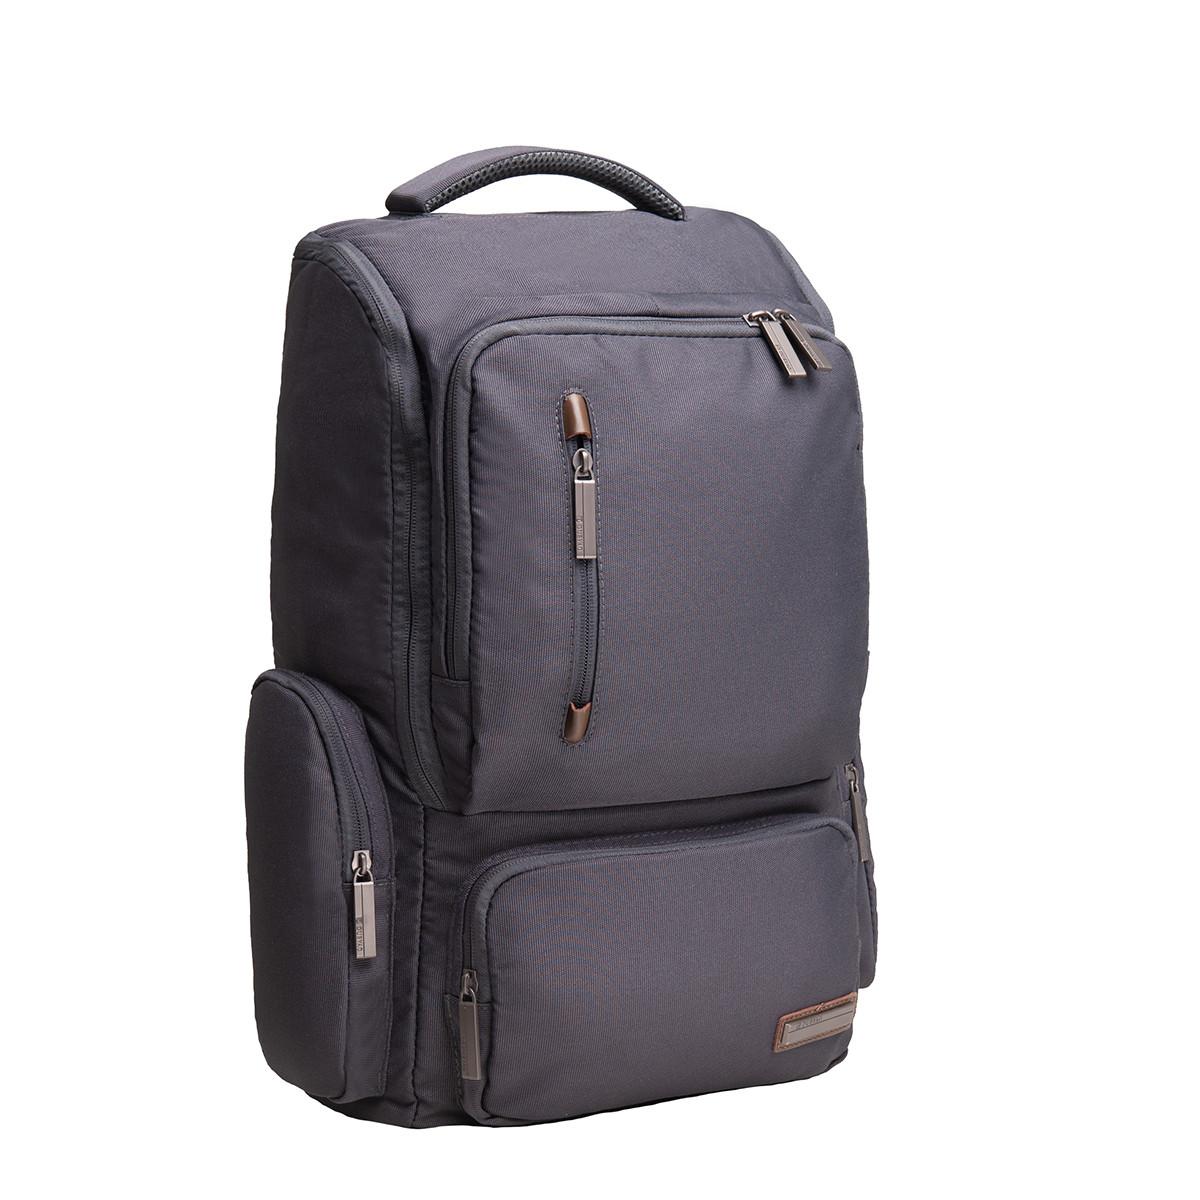 Рюкзак для ноутбука DUBYAO серый  28х46х12  ткань полиэстер   ксС41сер